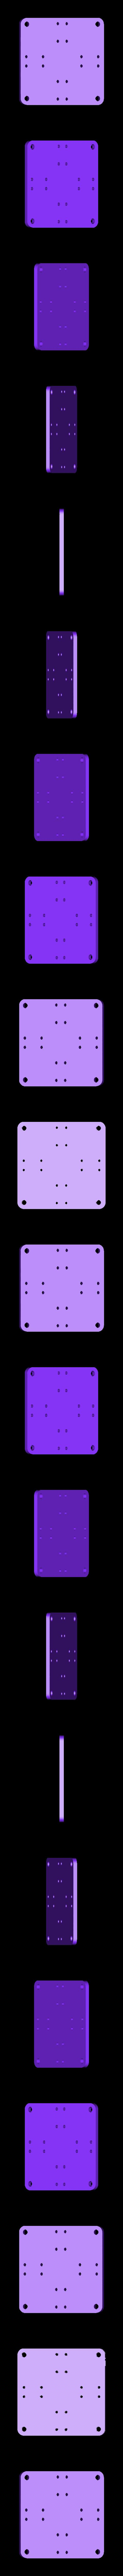 joy-button-pcb.stl Download free STL file Joy The Gamepad Controller • 3D printable object, Adafruit